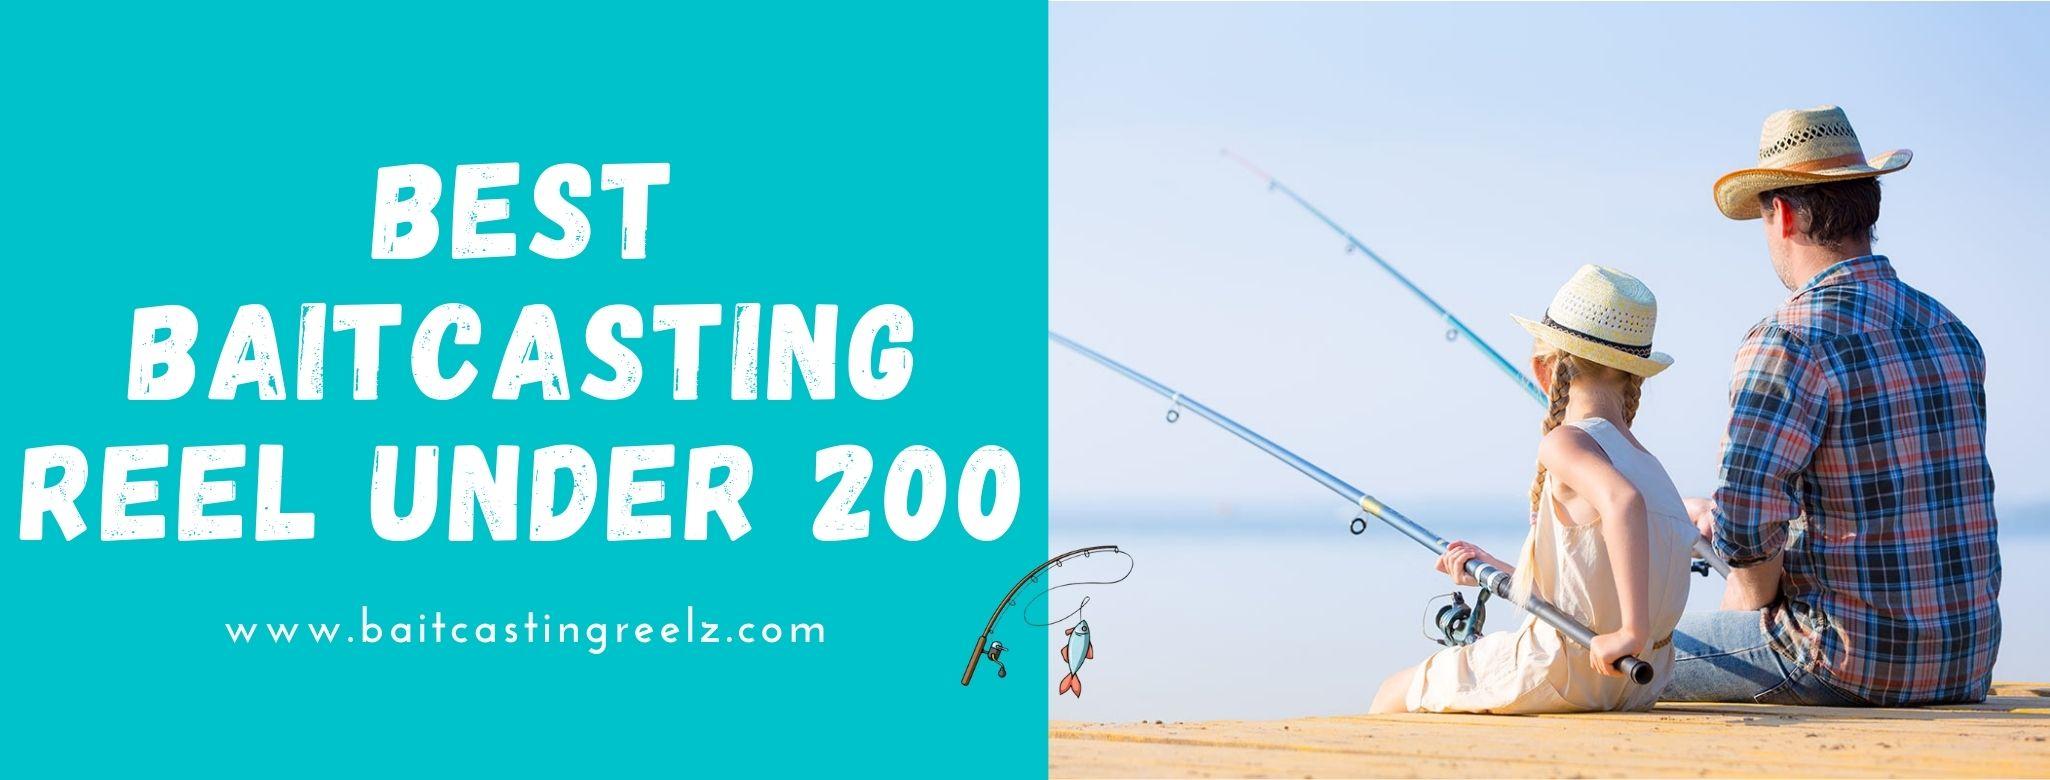 Best Baitcasting Reels Under 200